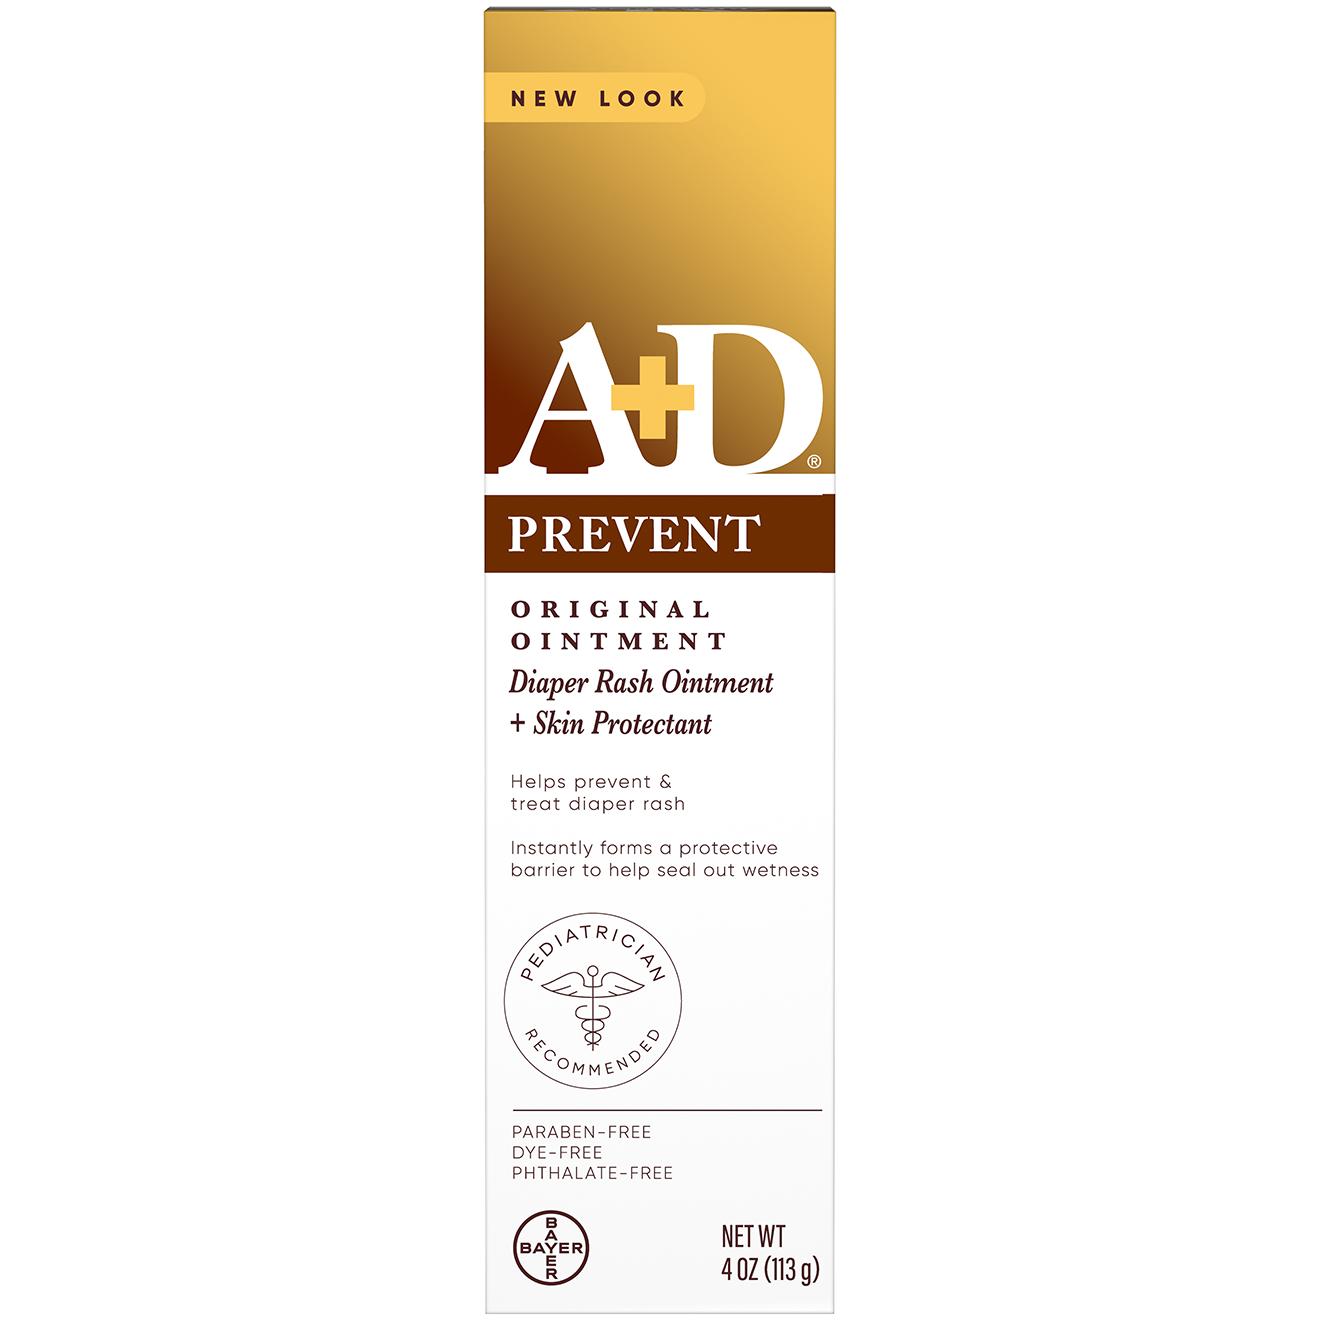 A+D Original Ointment Pomada para Assadura Bisnaga 113g